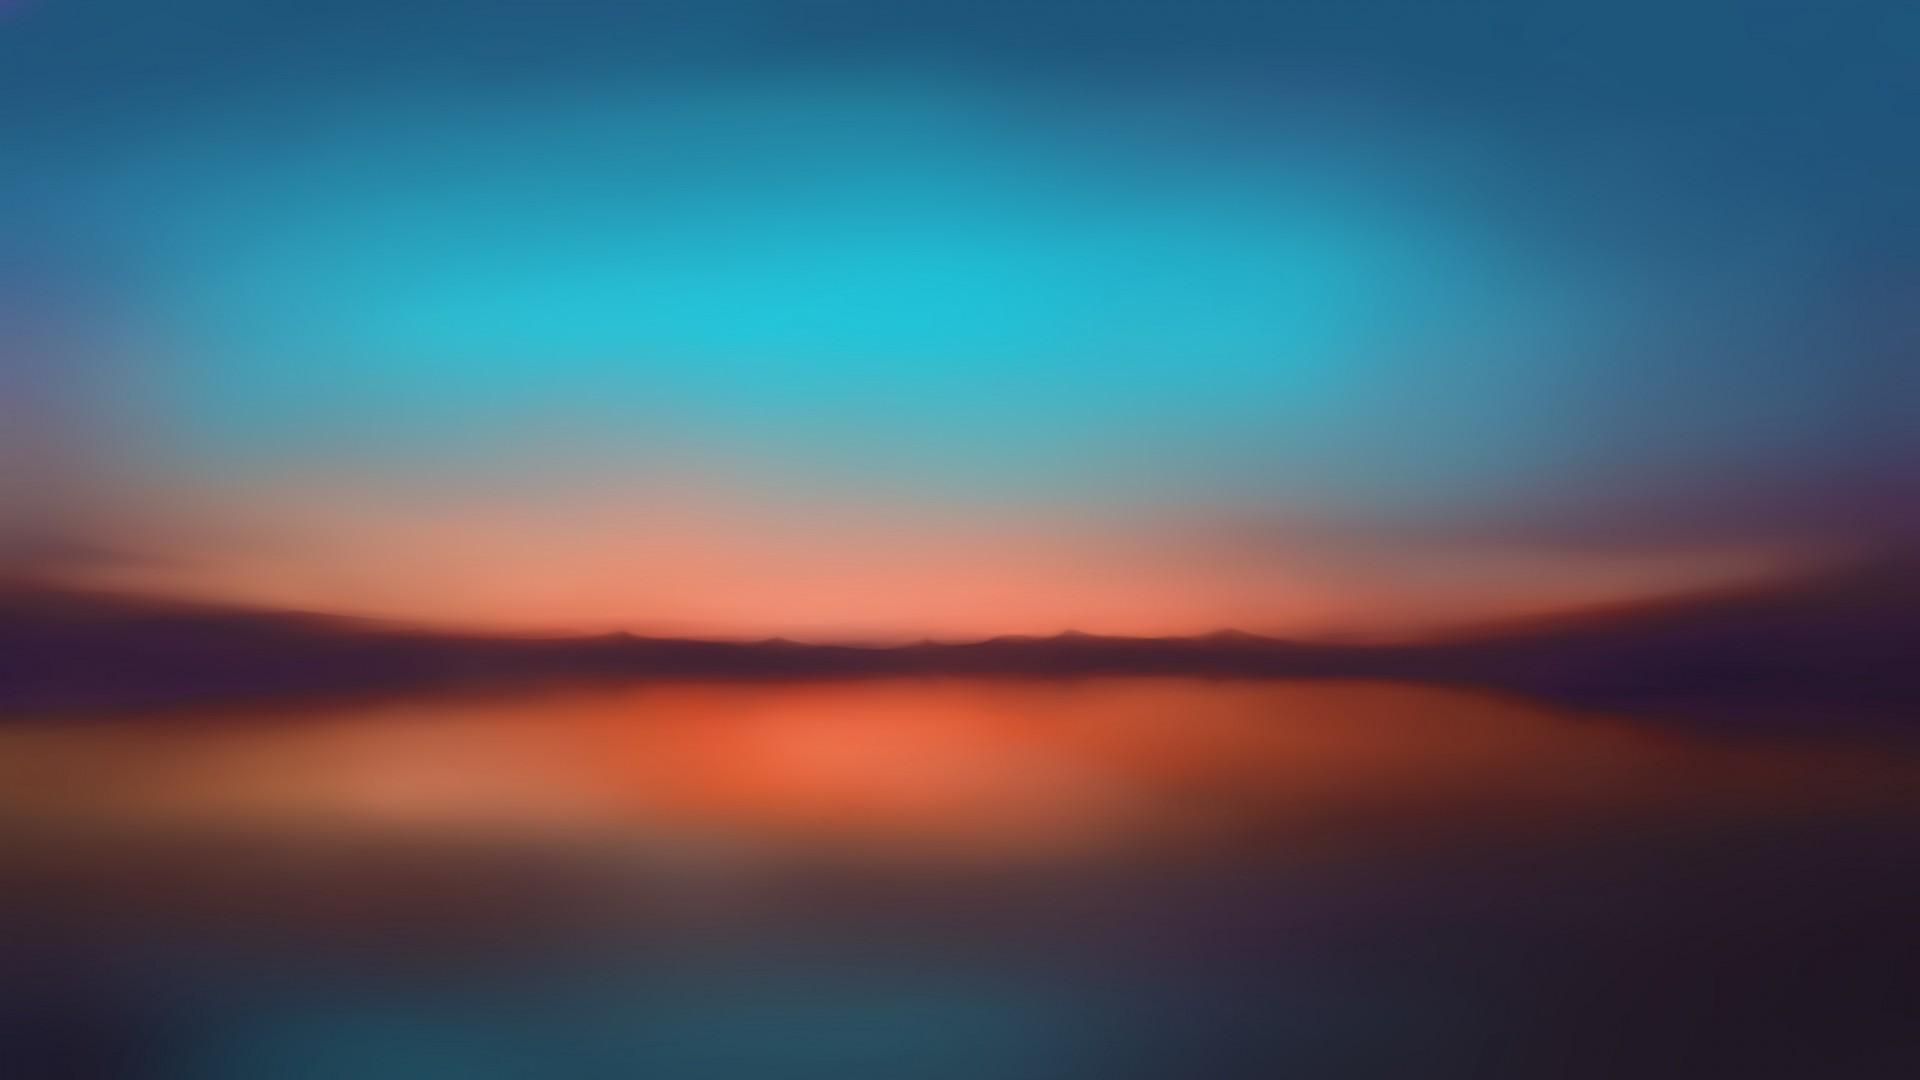 Windows 10 Wallpapers Hd Fall Sunset Minimal 5k Wallpapers Hd Wallpapers Id 24304